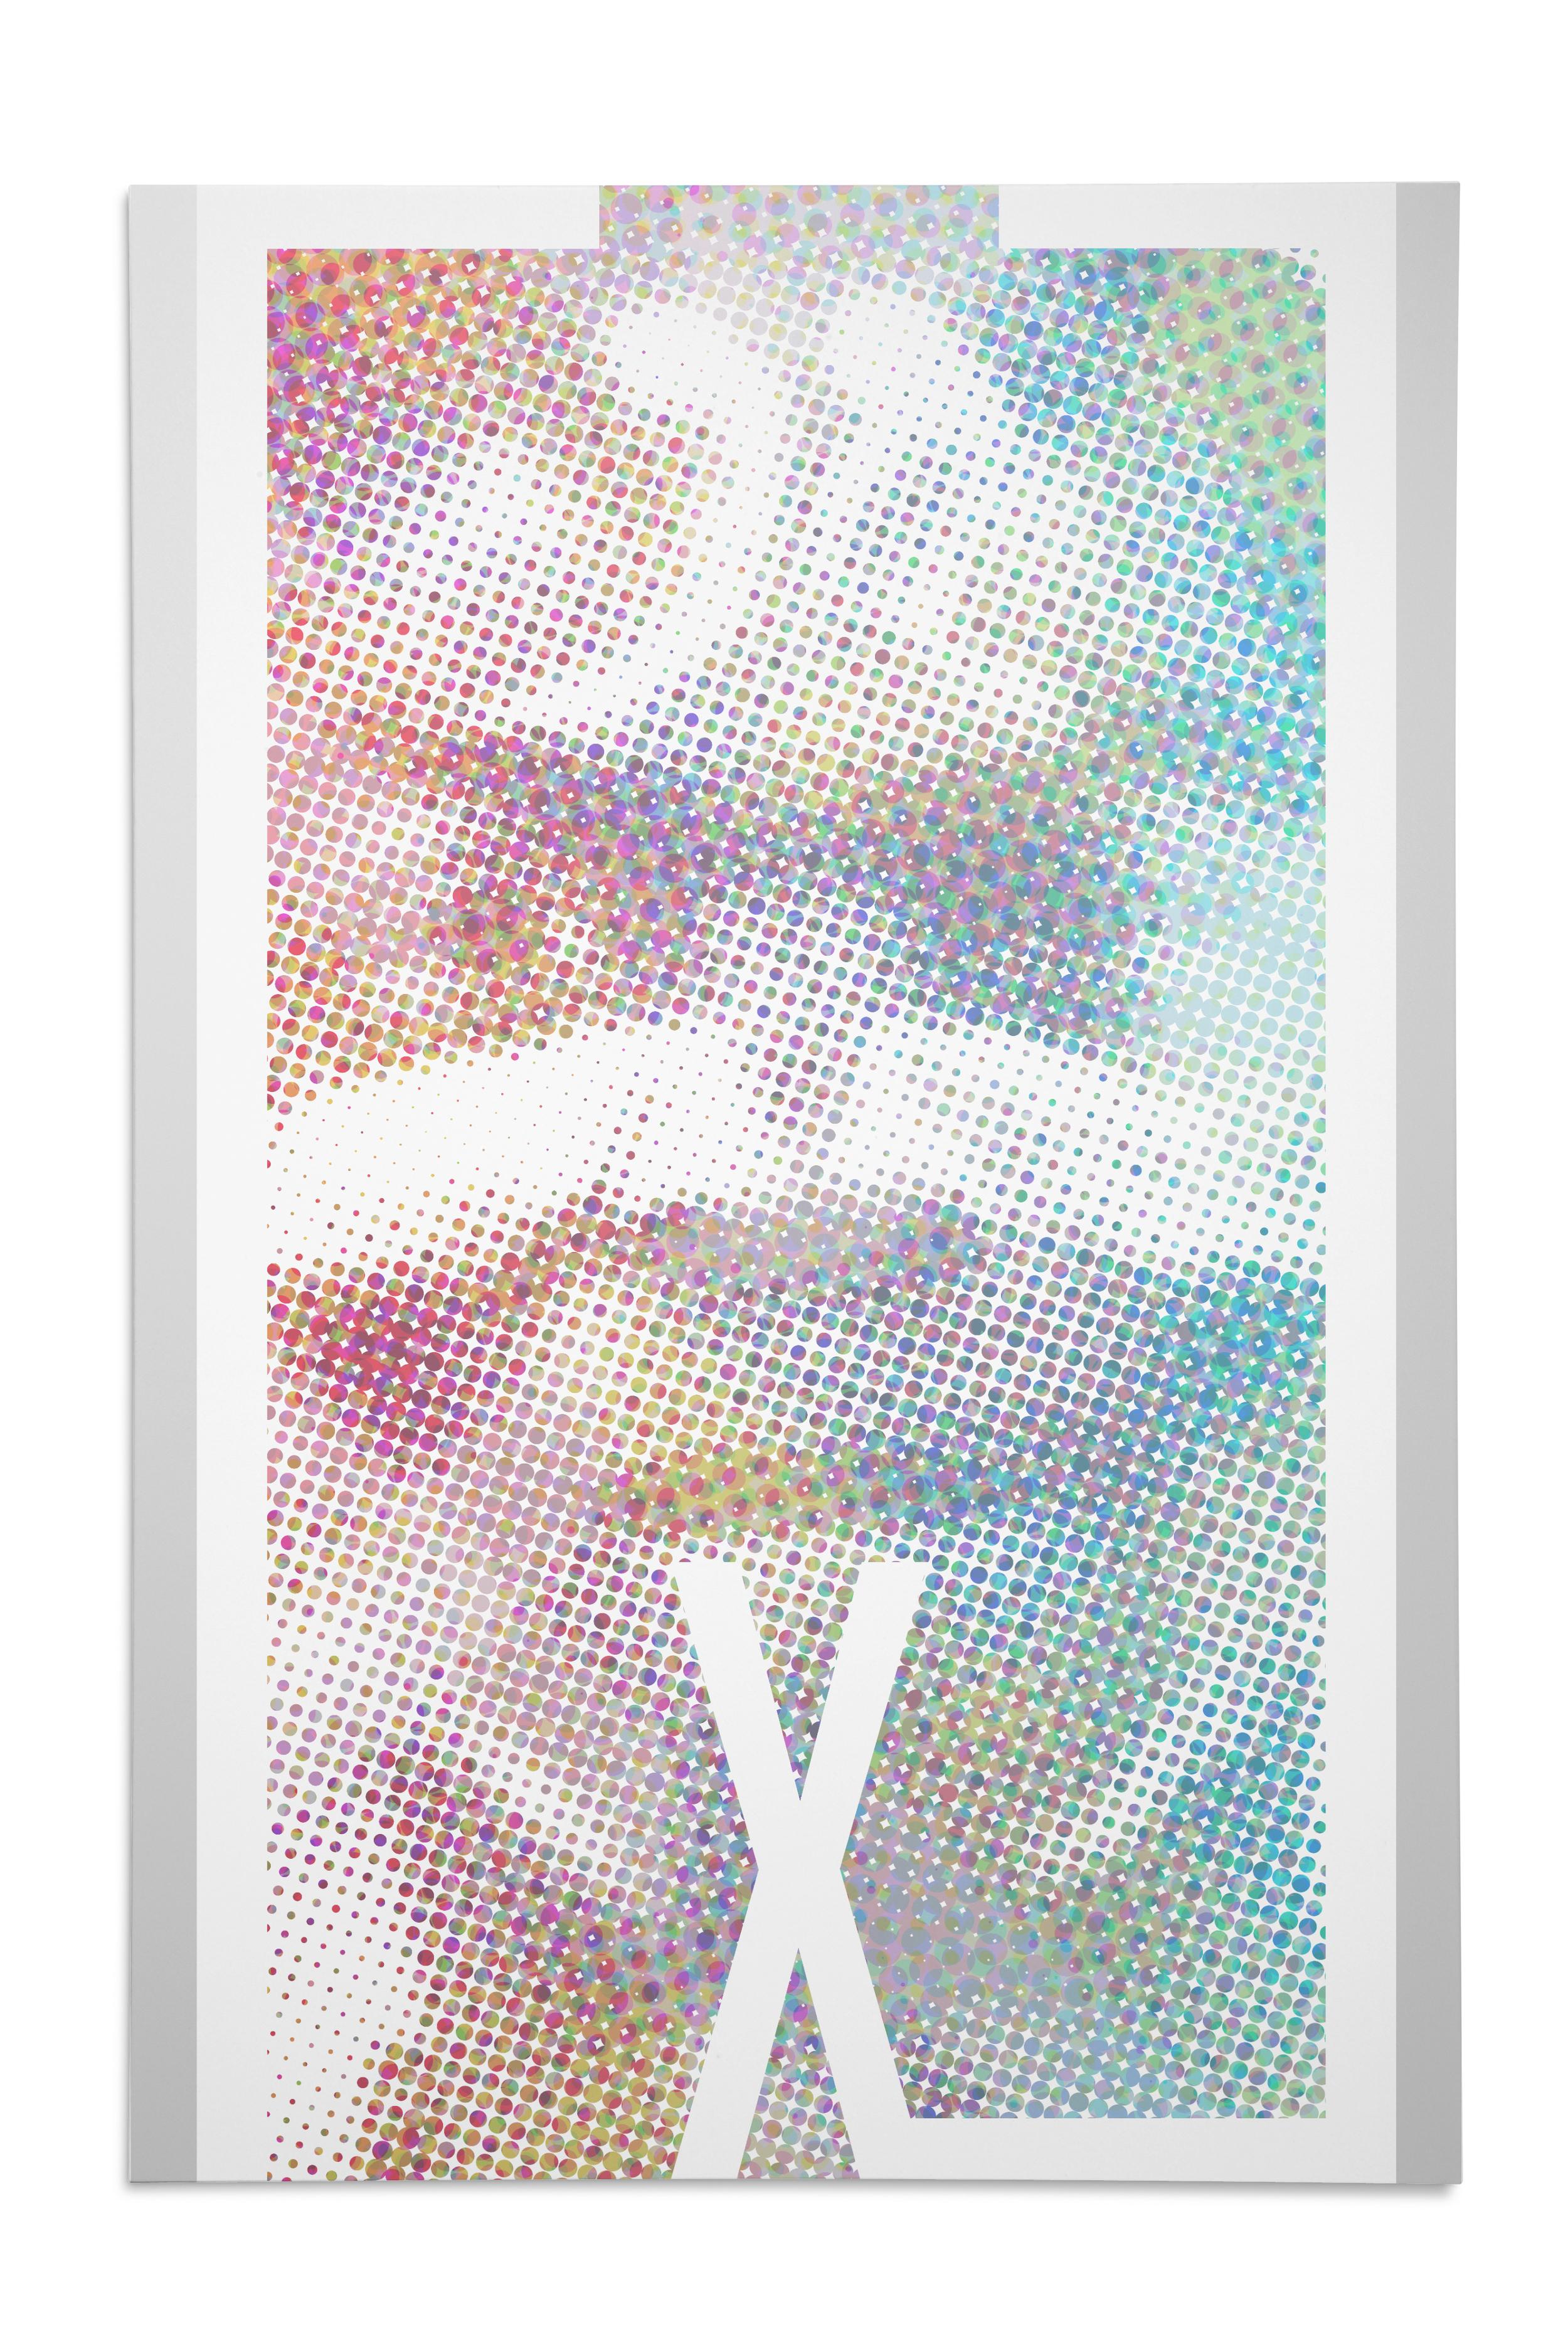 juicebox poster 02